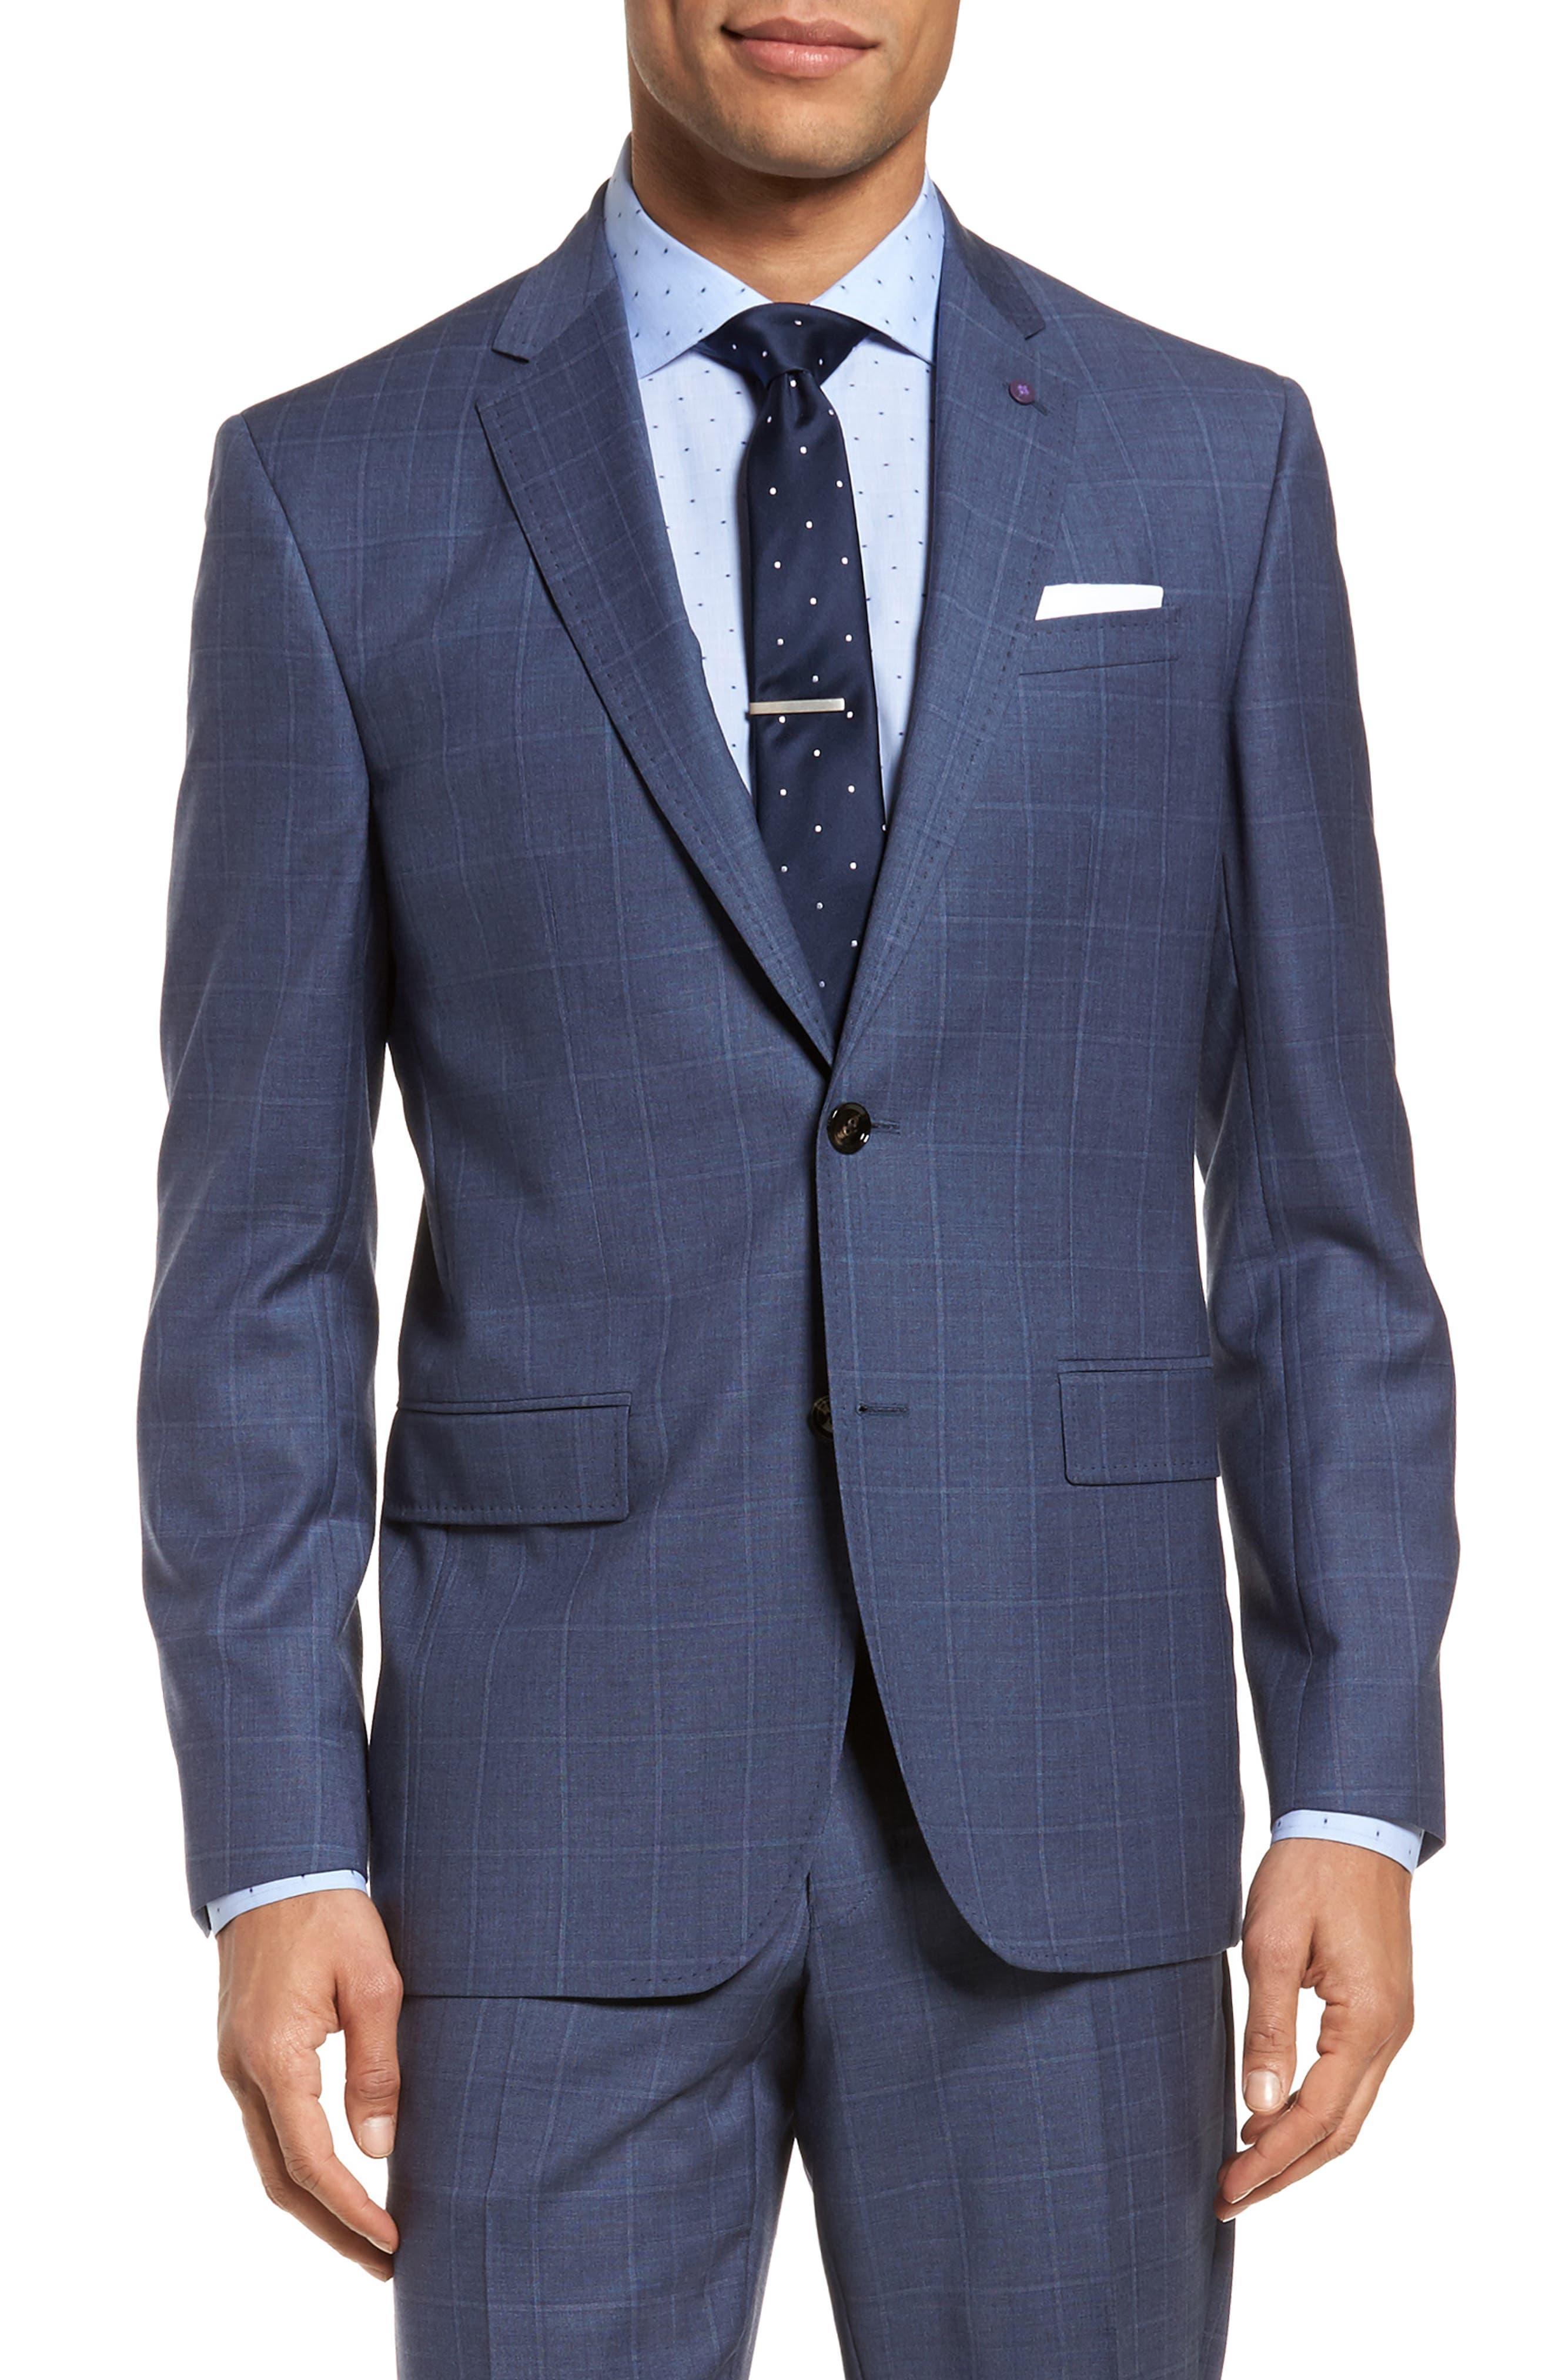 Jay Trim Fit Windowpane Wool Suit,                             Alternate thumbnail 5, color,                             Med Blue